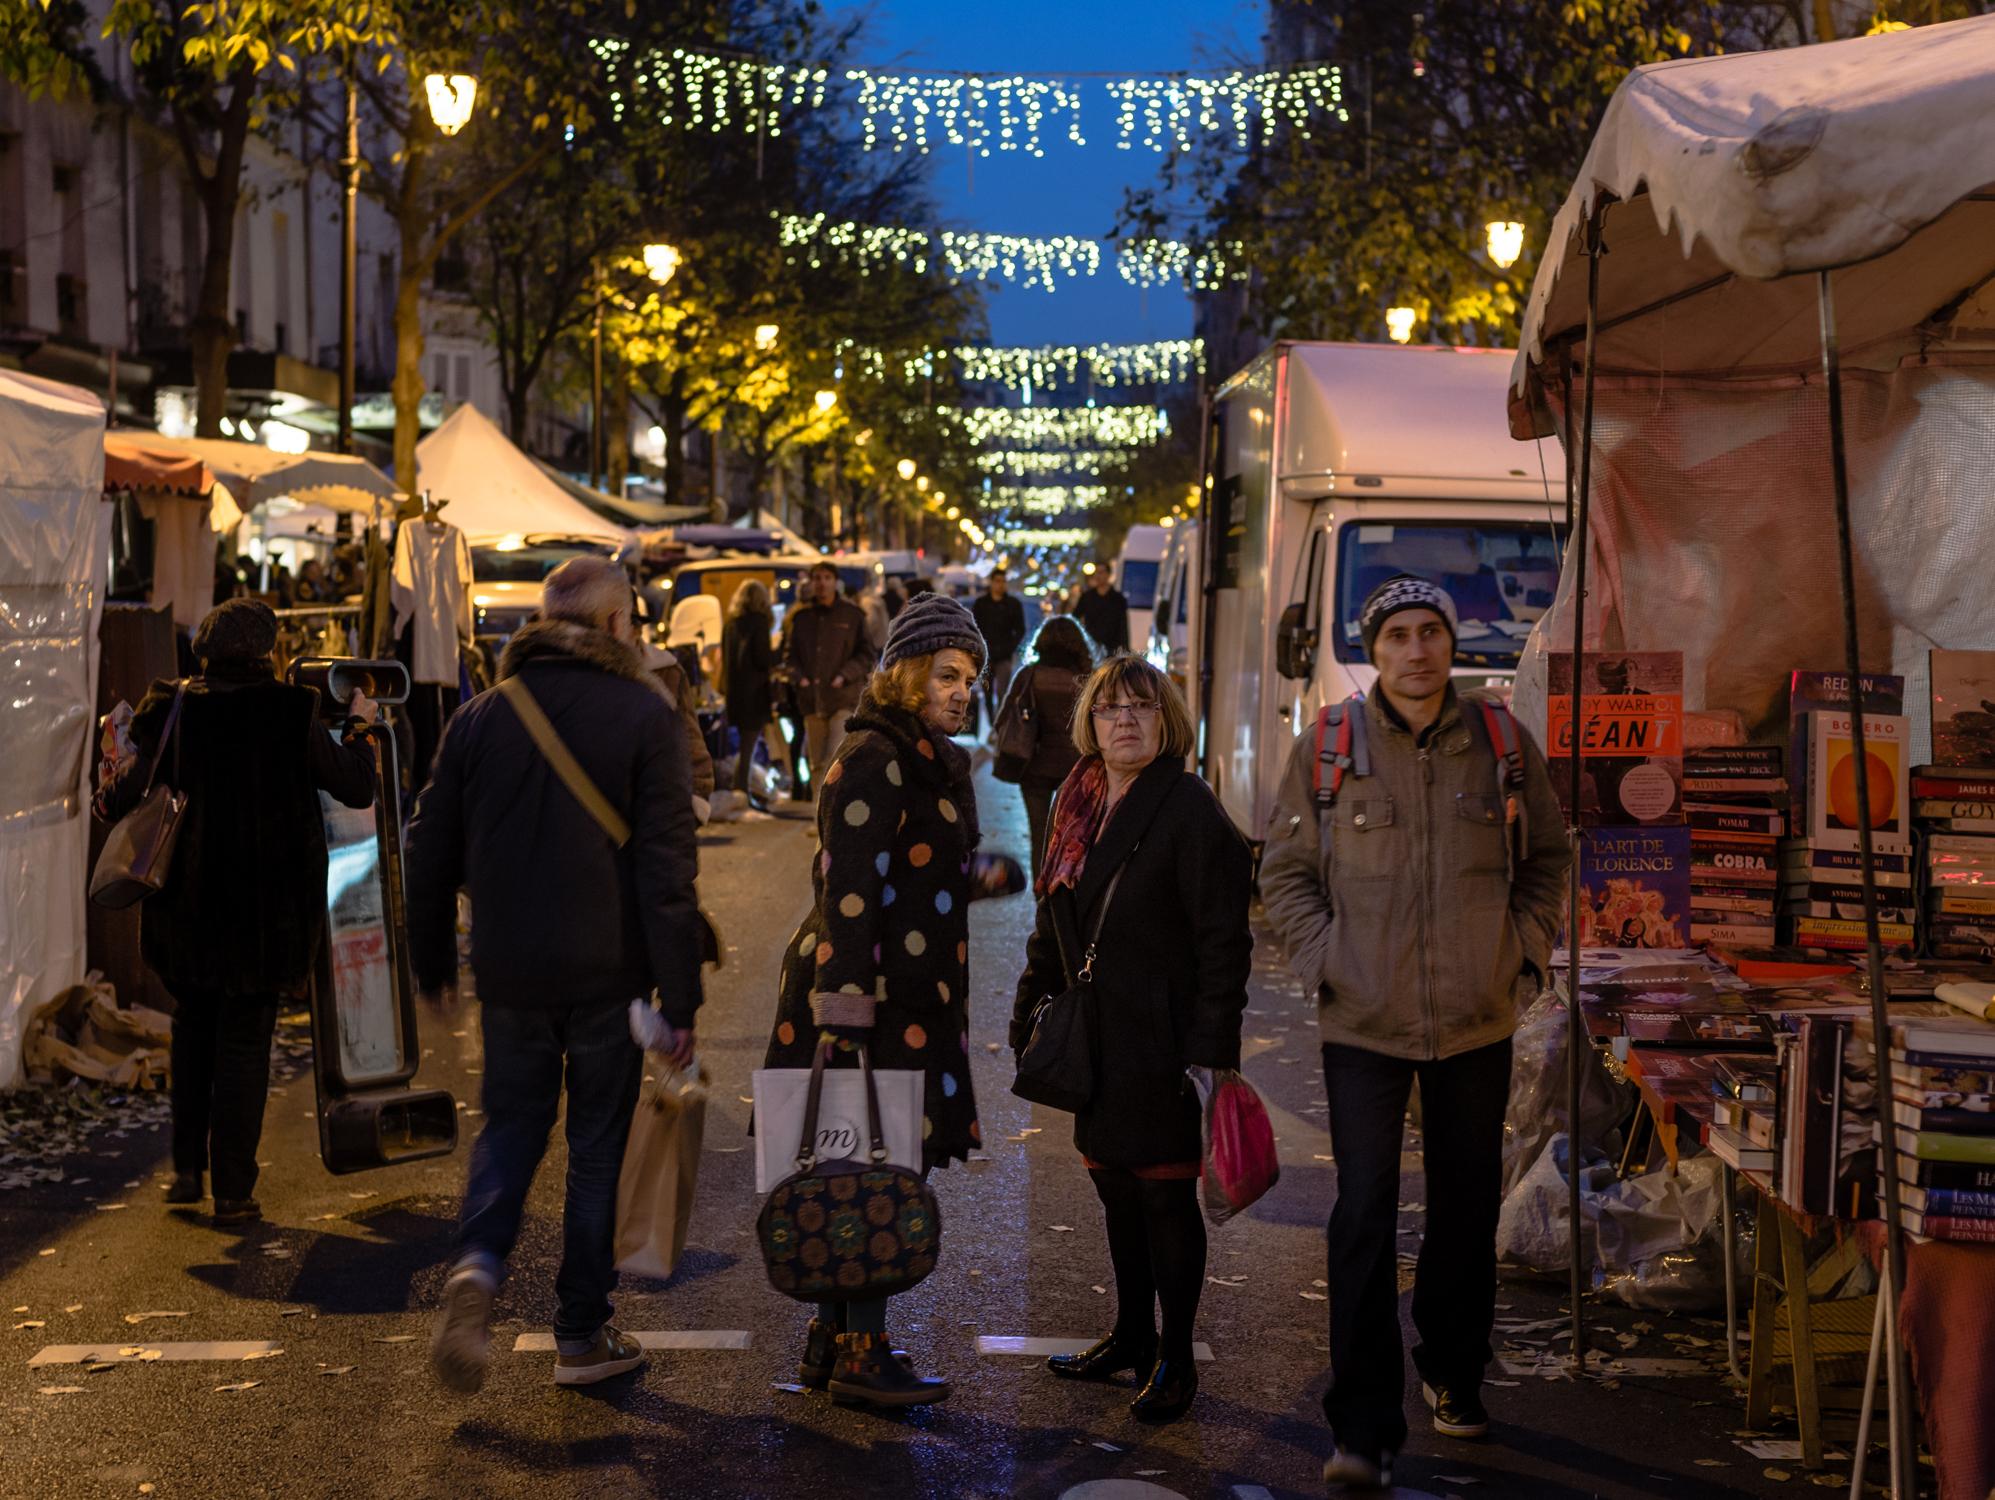 Sunday evening street markets in the Marais